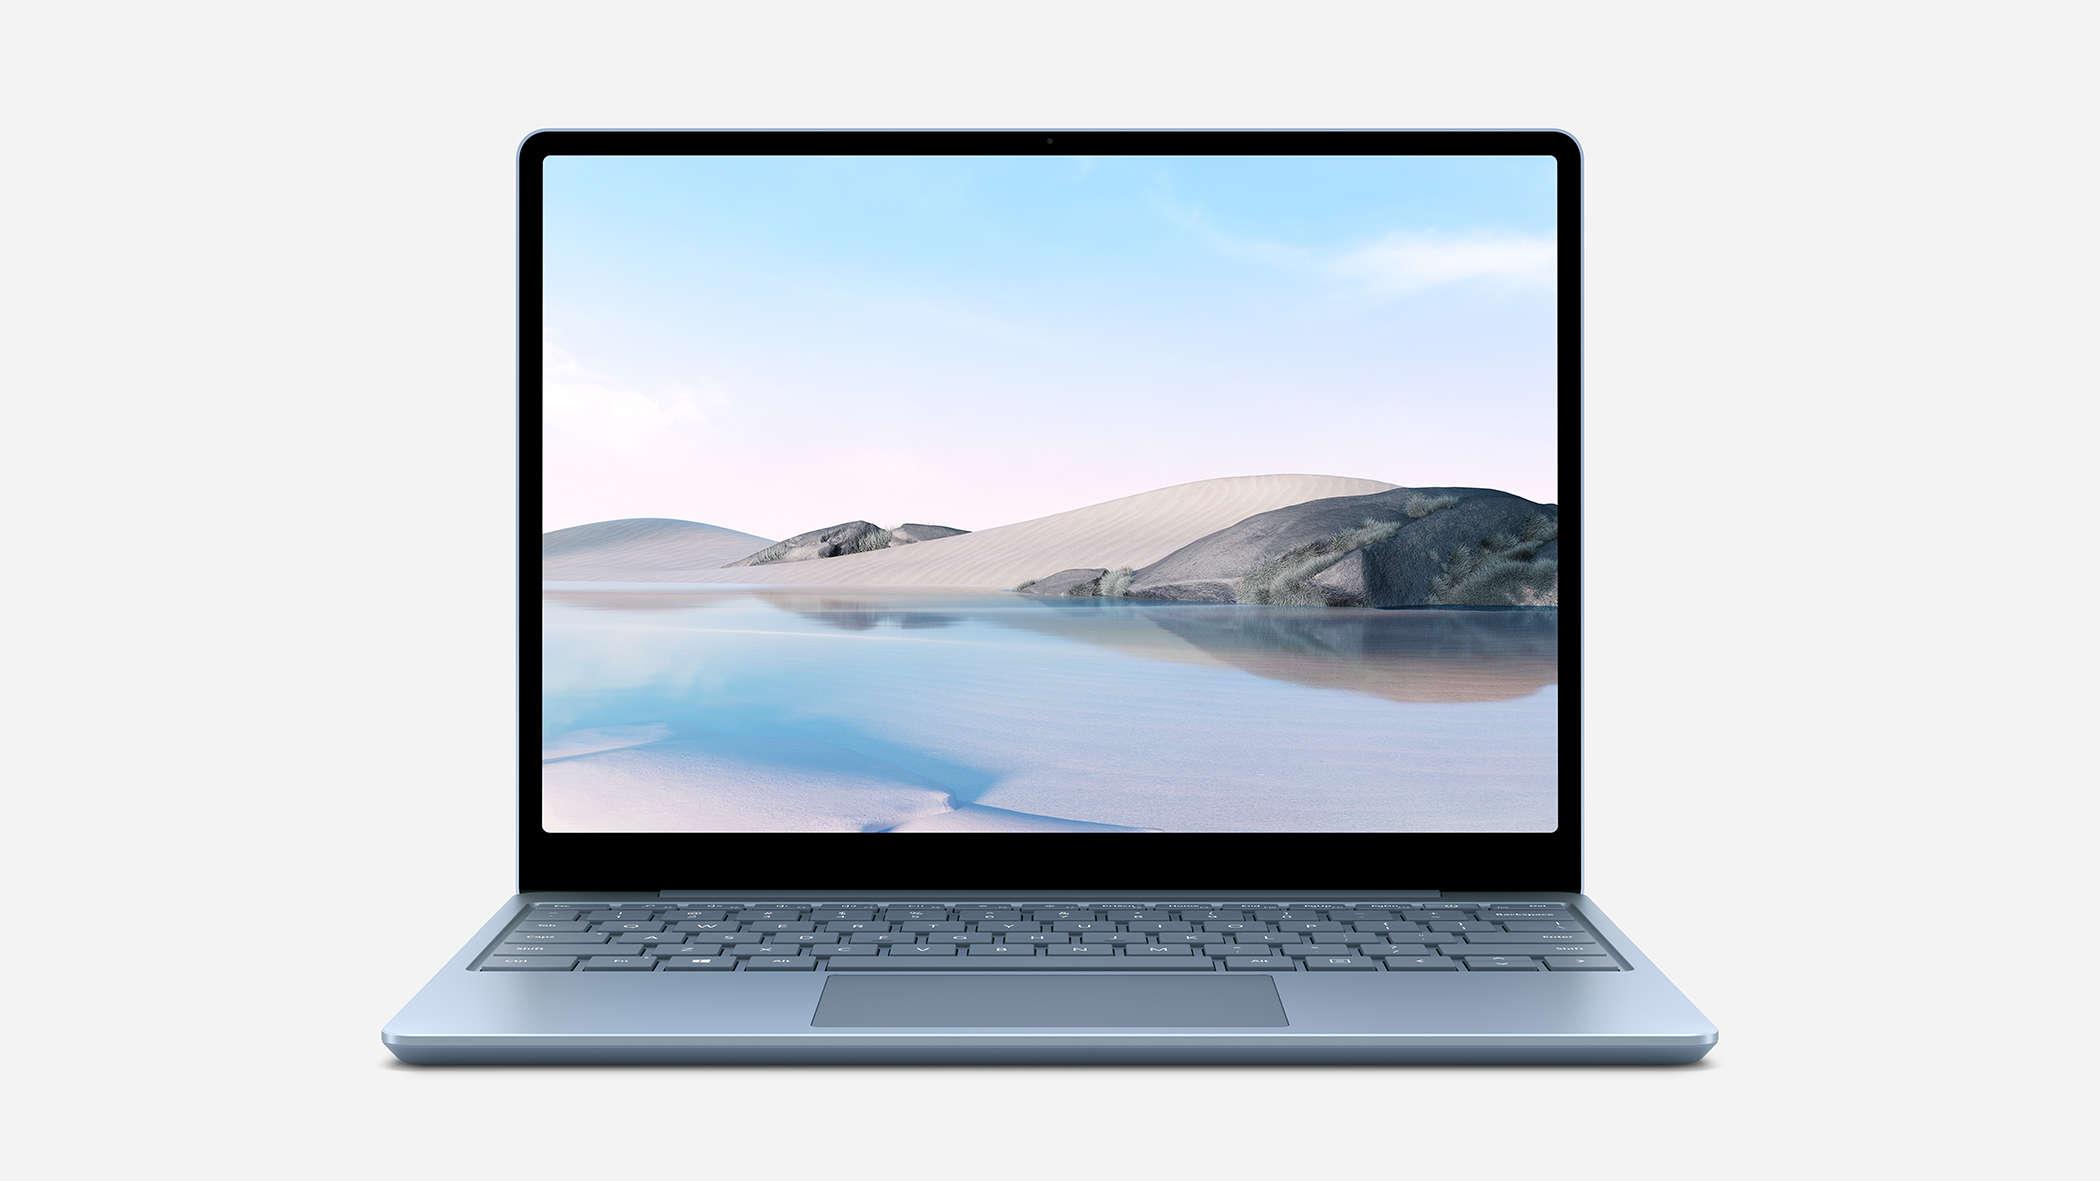 Microsoft Laptop Go price in India starts at INR 63,499